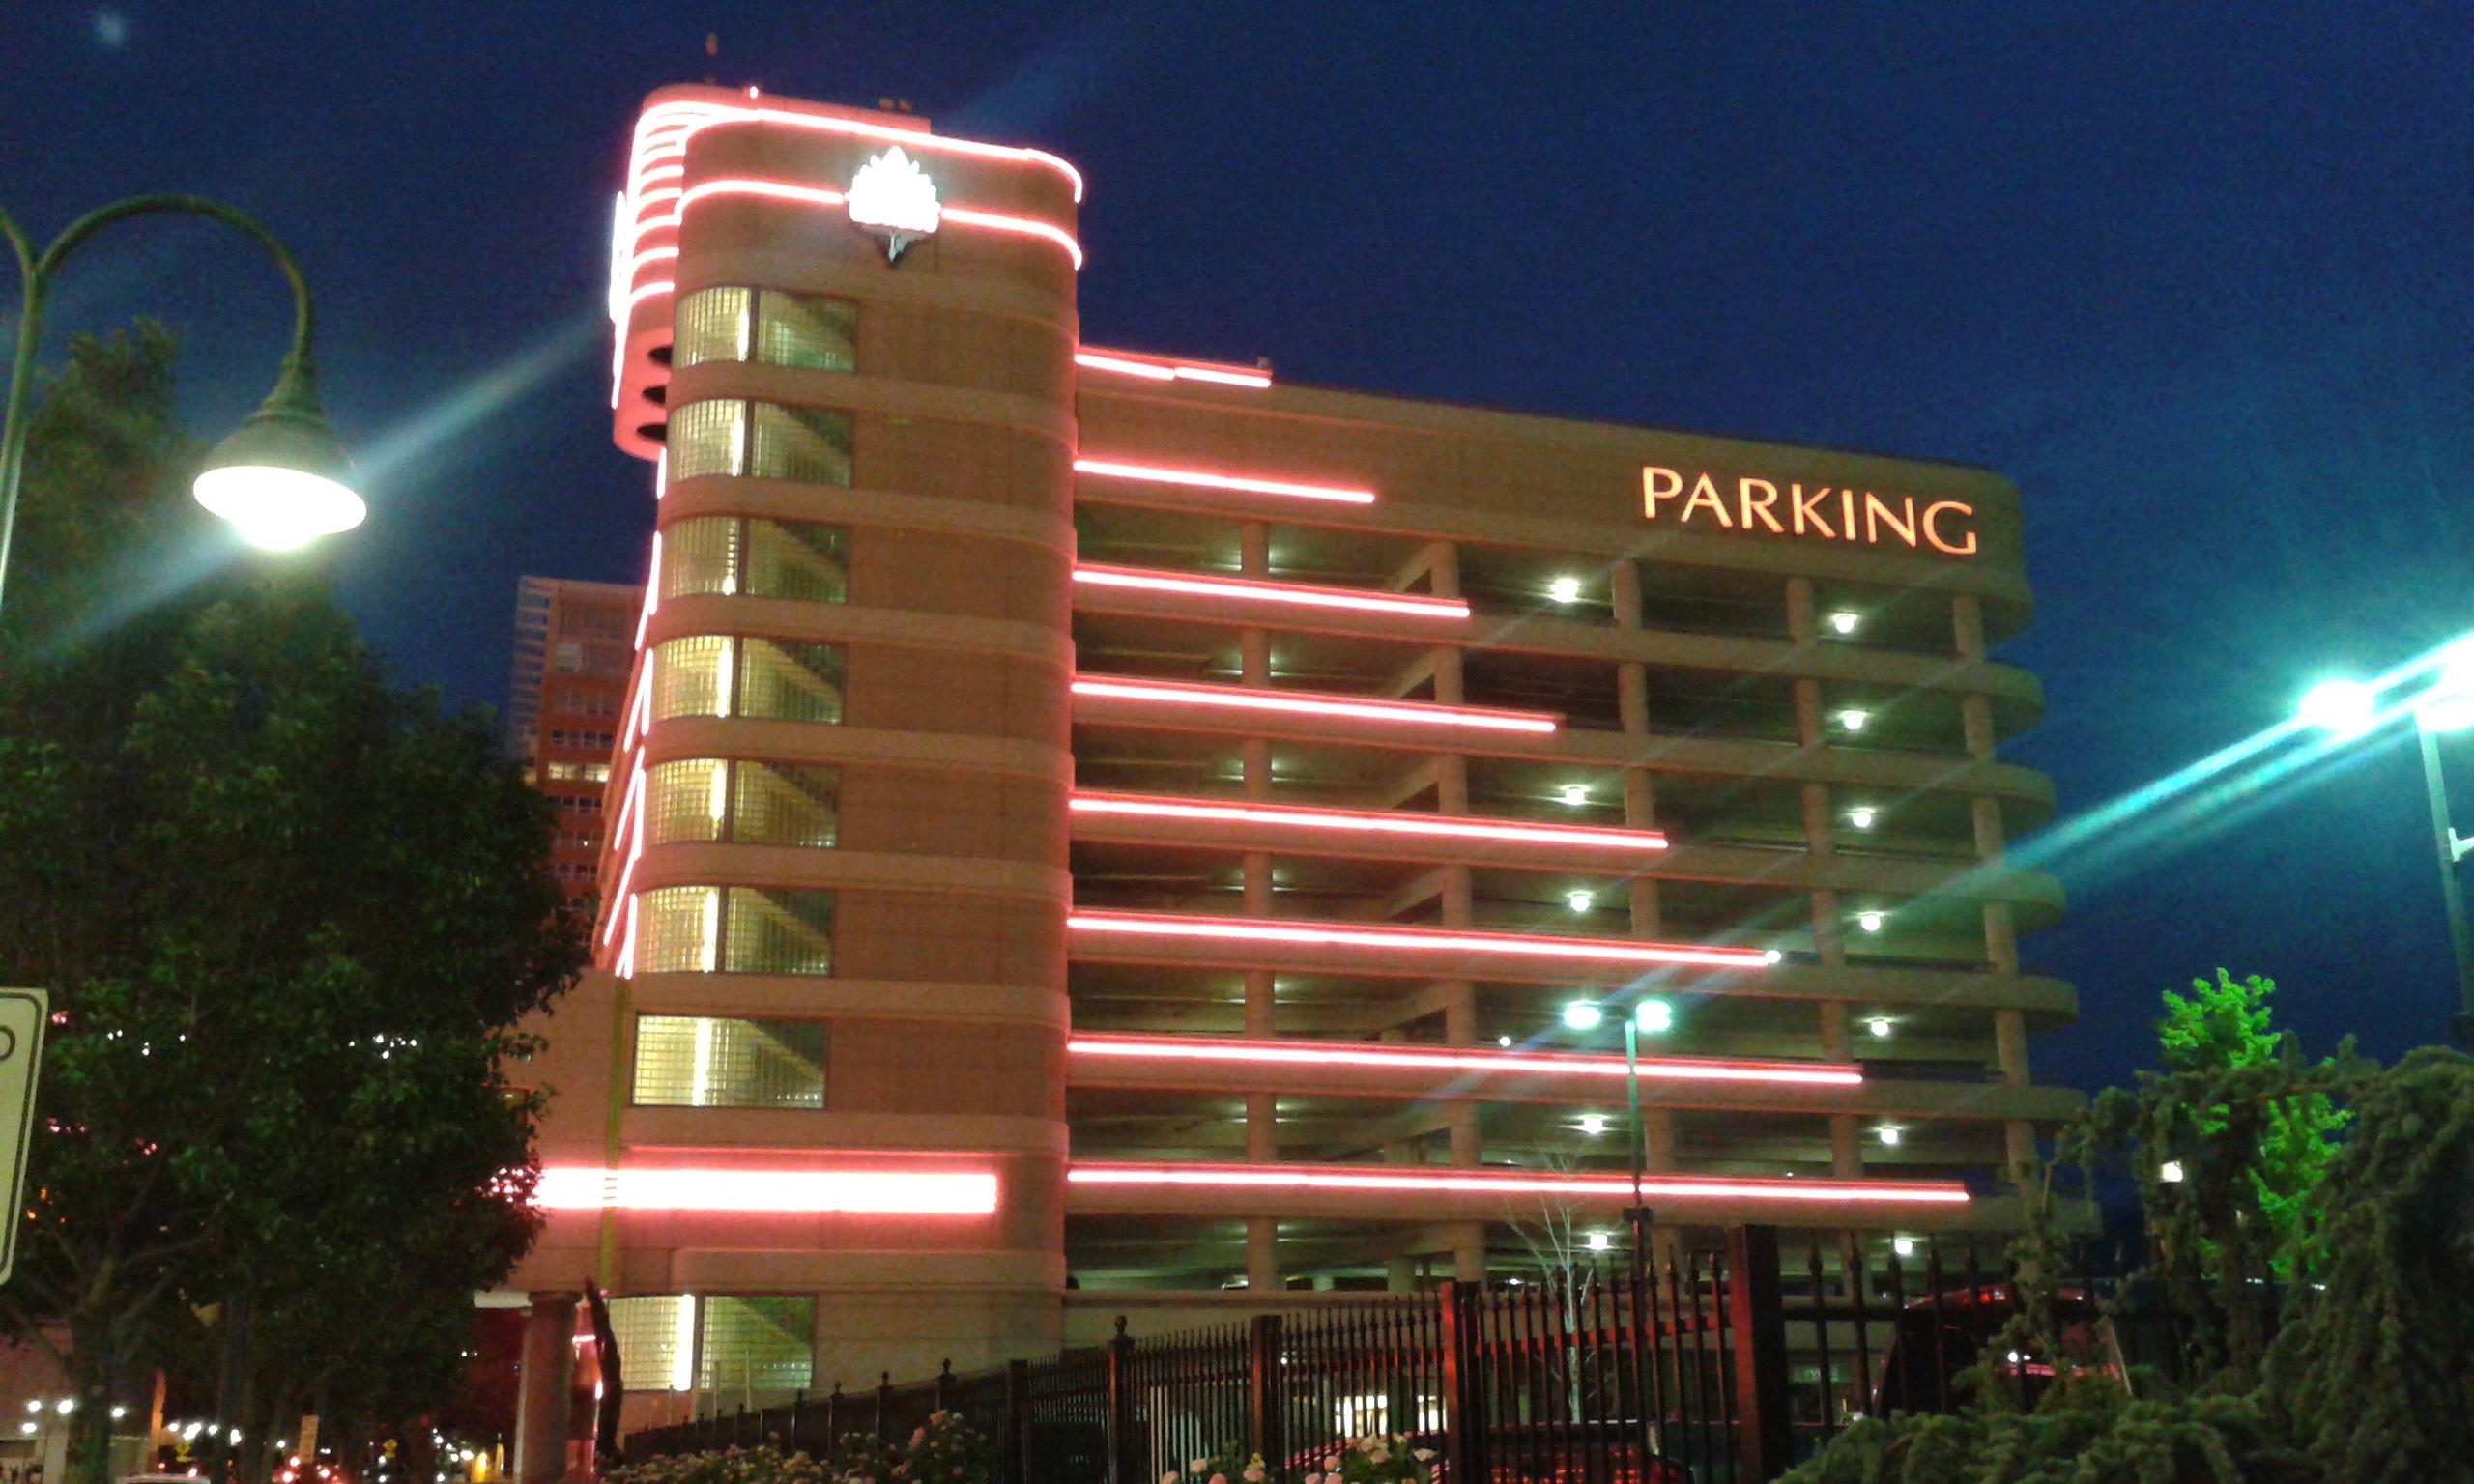 File Eldorado Parking Garage Reno Nv Jpg Wikimedia Commons